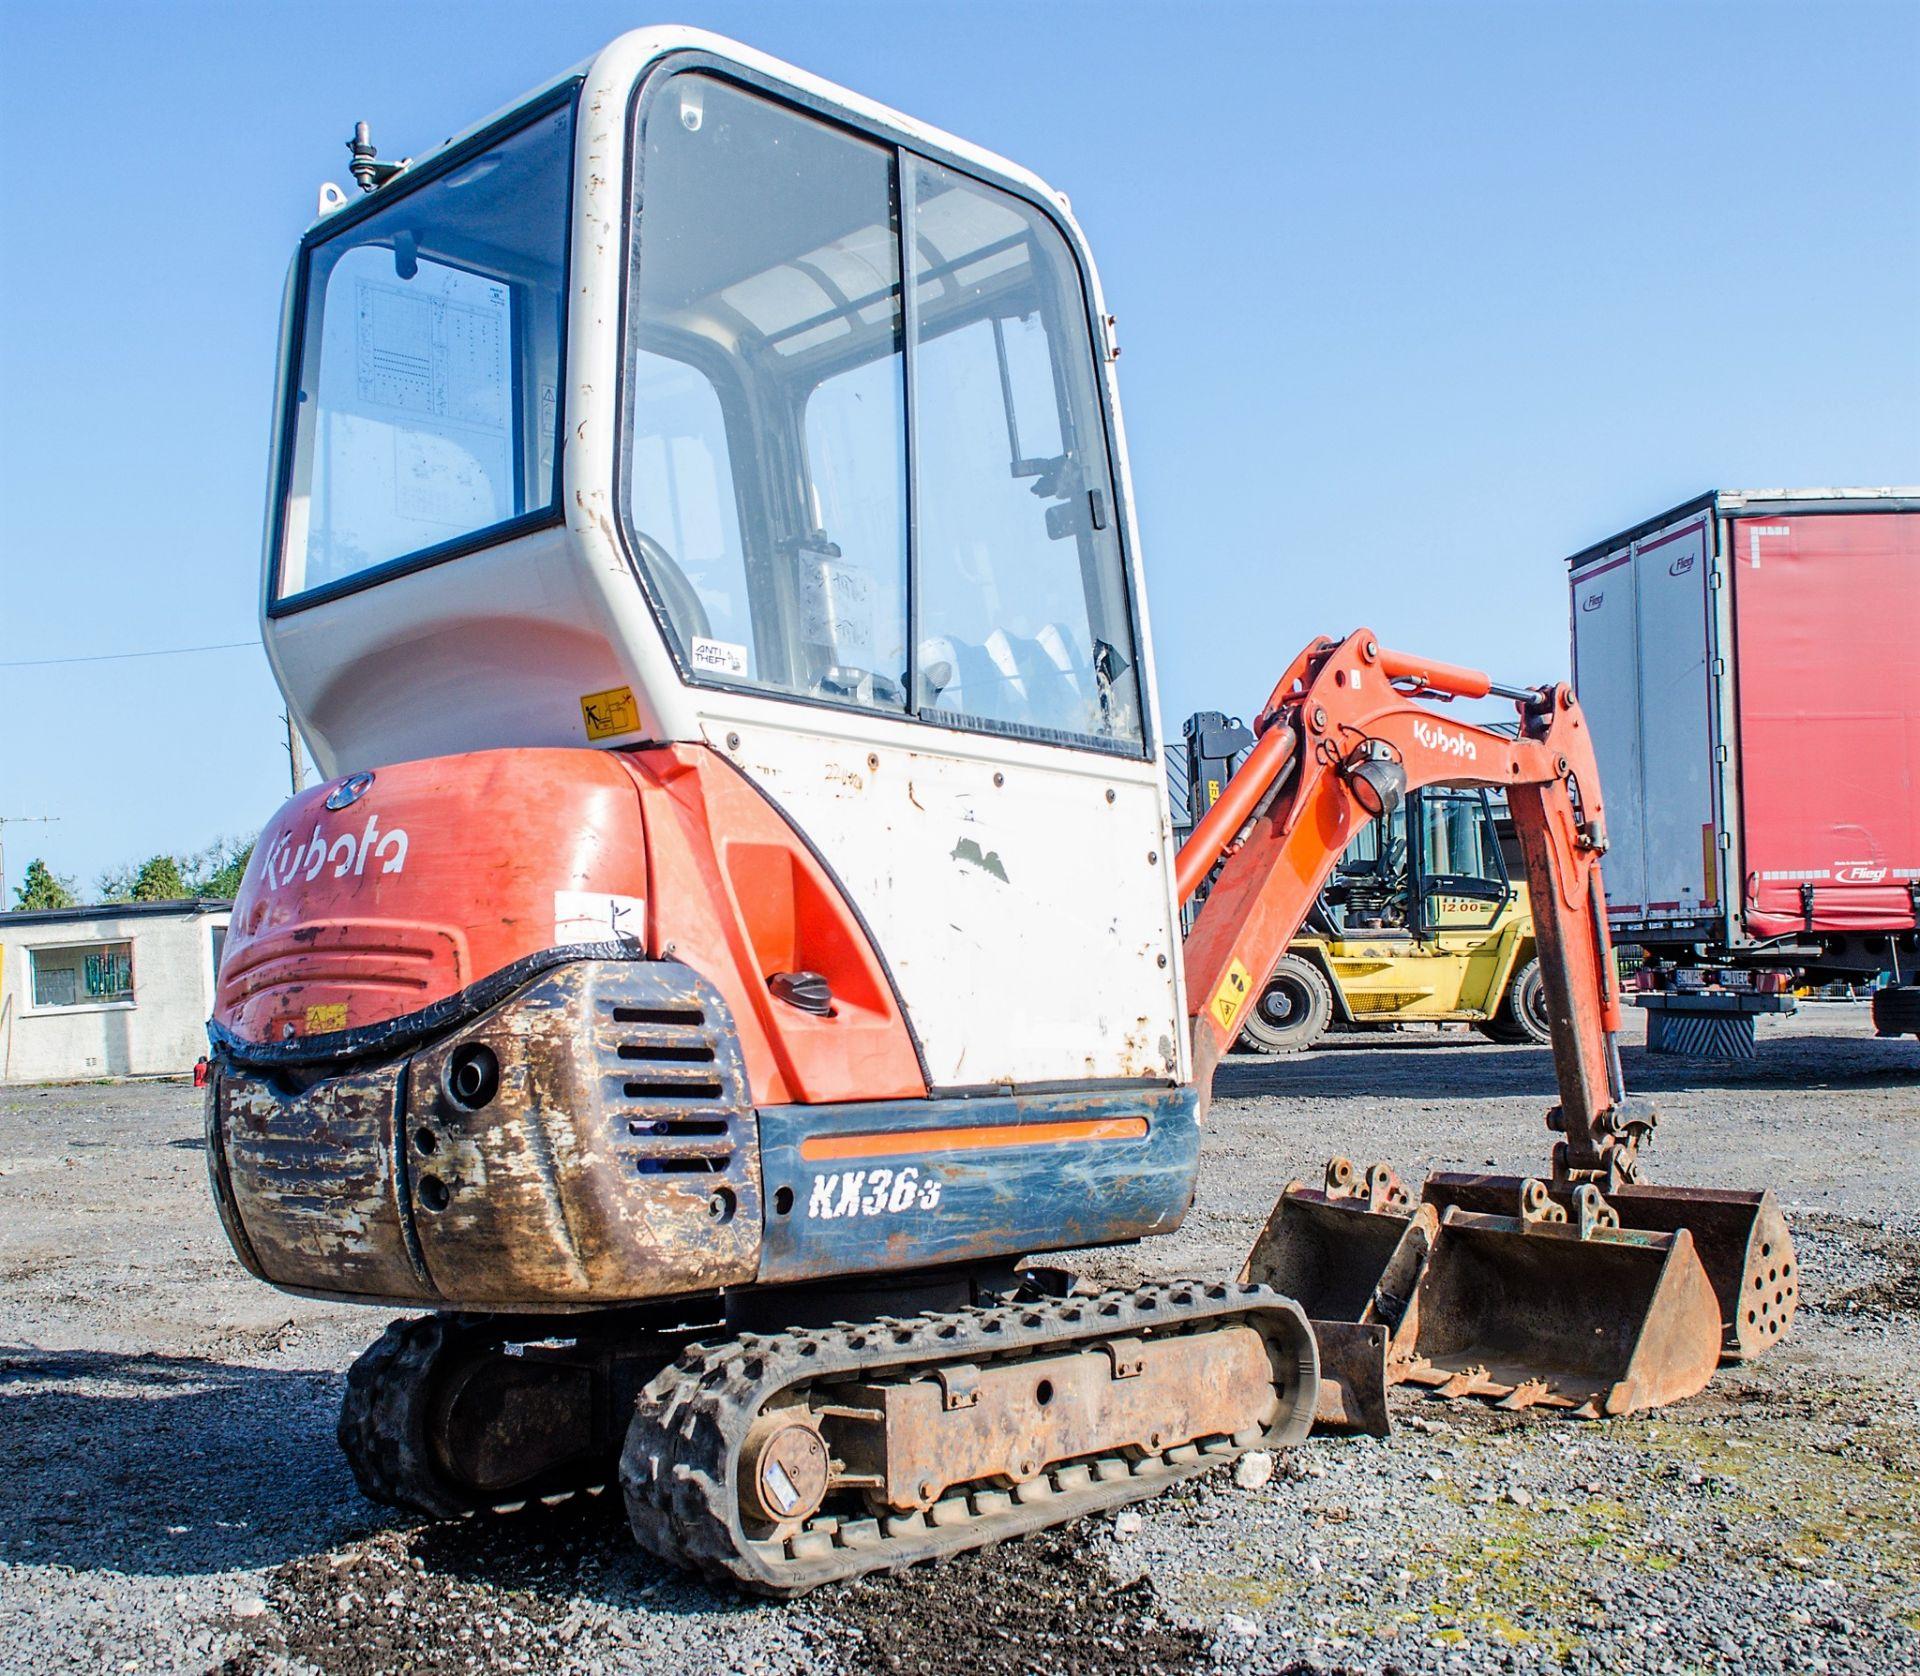 Kubota KX36-3 1.5 tonne rubber tracked mini excavator Year: 2007 S/N: Z077298 Recorded Hours: 4205 - Image 4 of 18